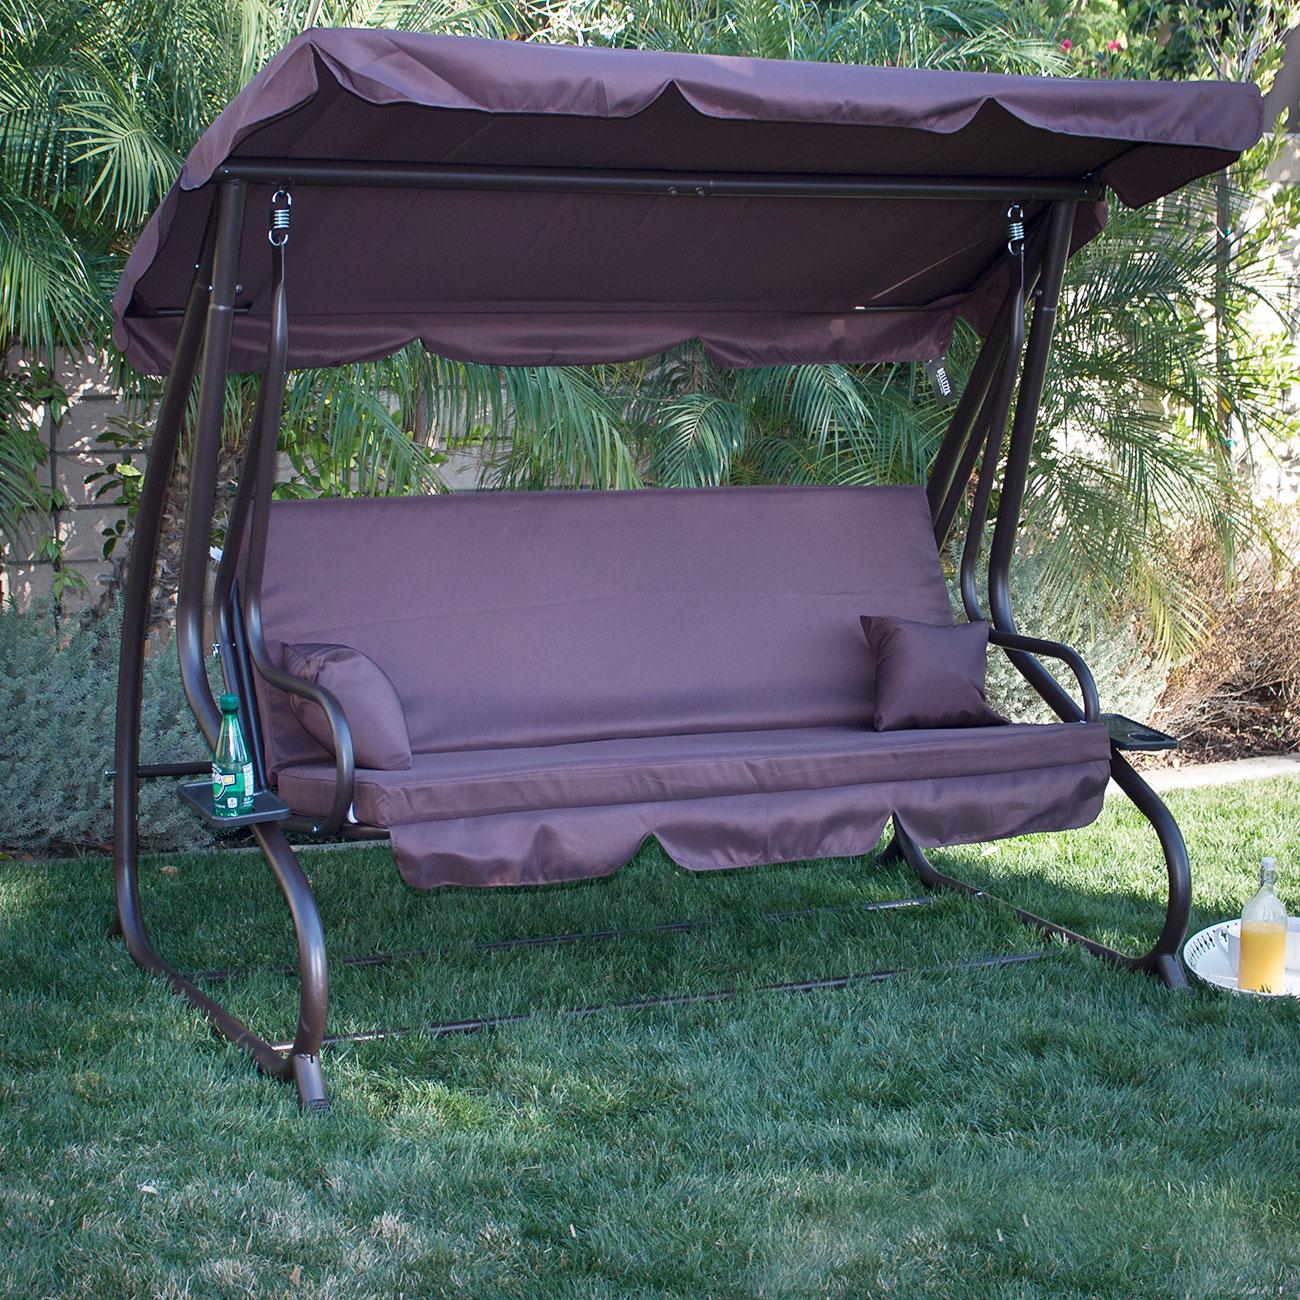 Belleze Patio Outdoor Padded Porch Swing Bed with Adjustable Tilt Canopy, Dark Brown